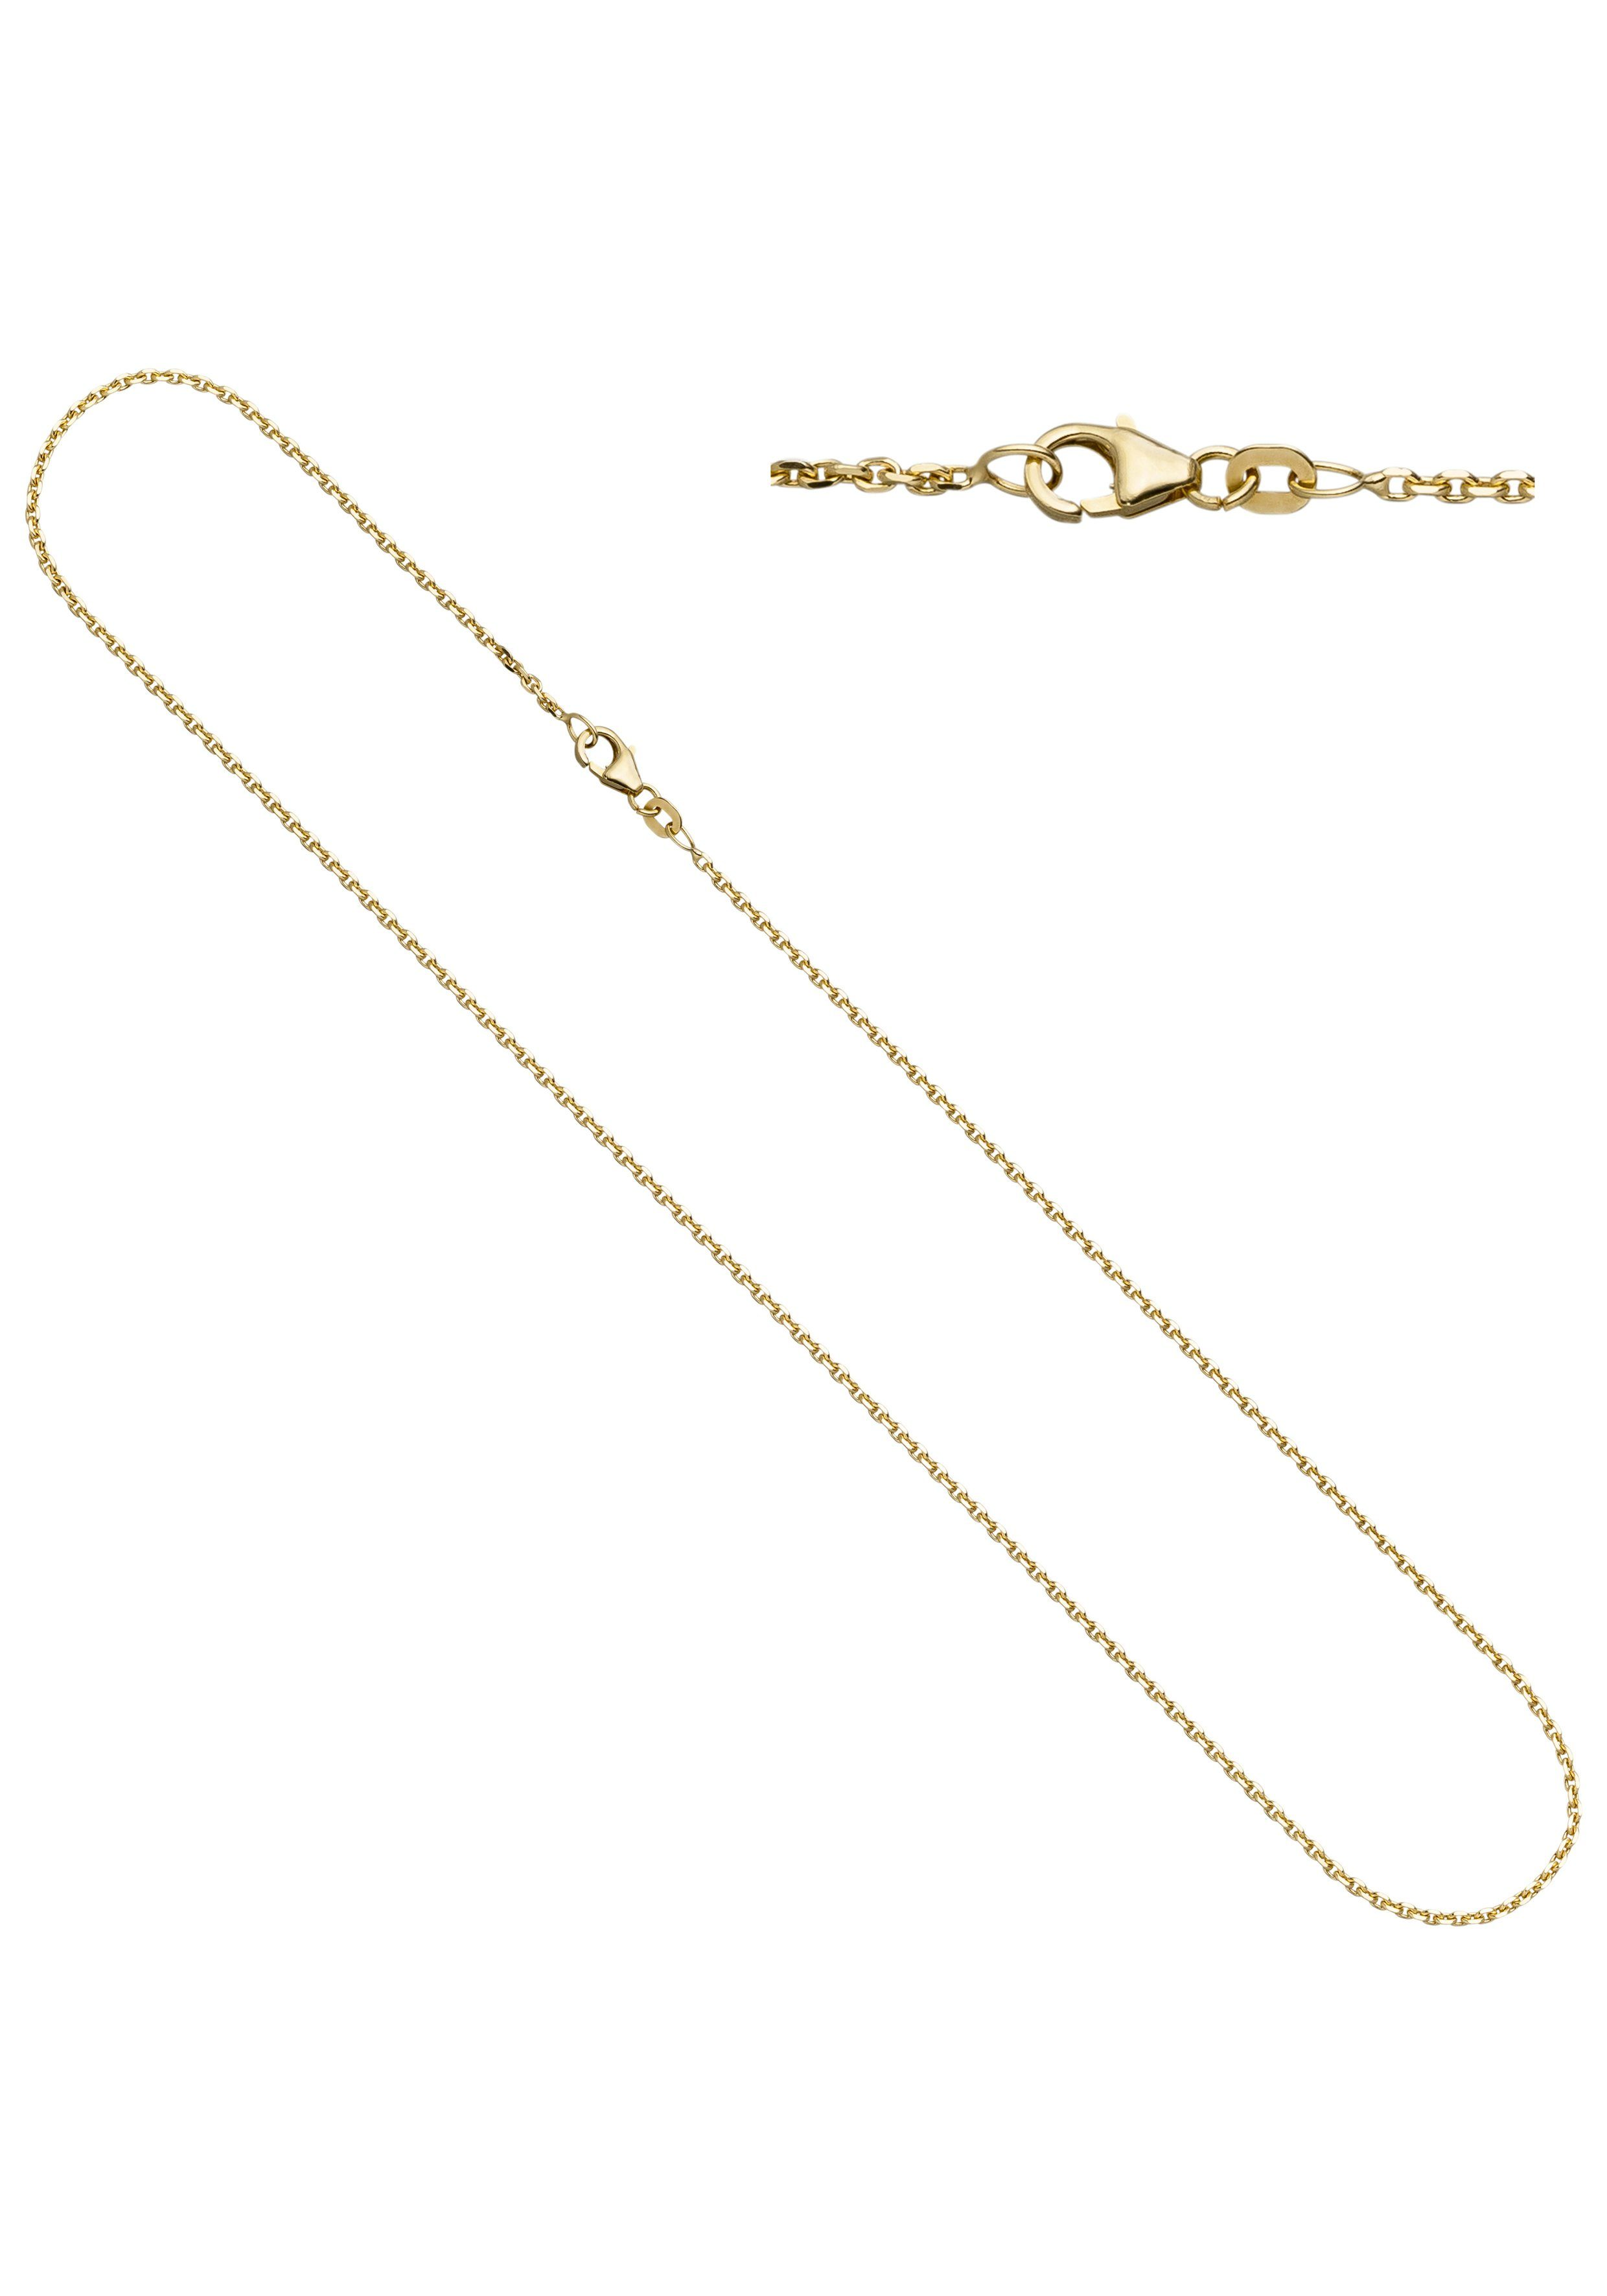 JOBO Goldkette Ankerkette 333 Gold diamantiert 45 cm 1,2 mm